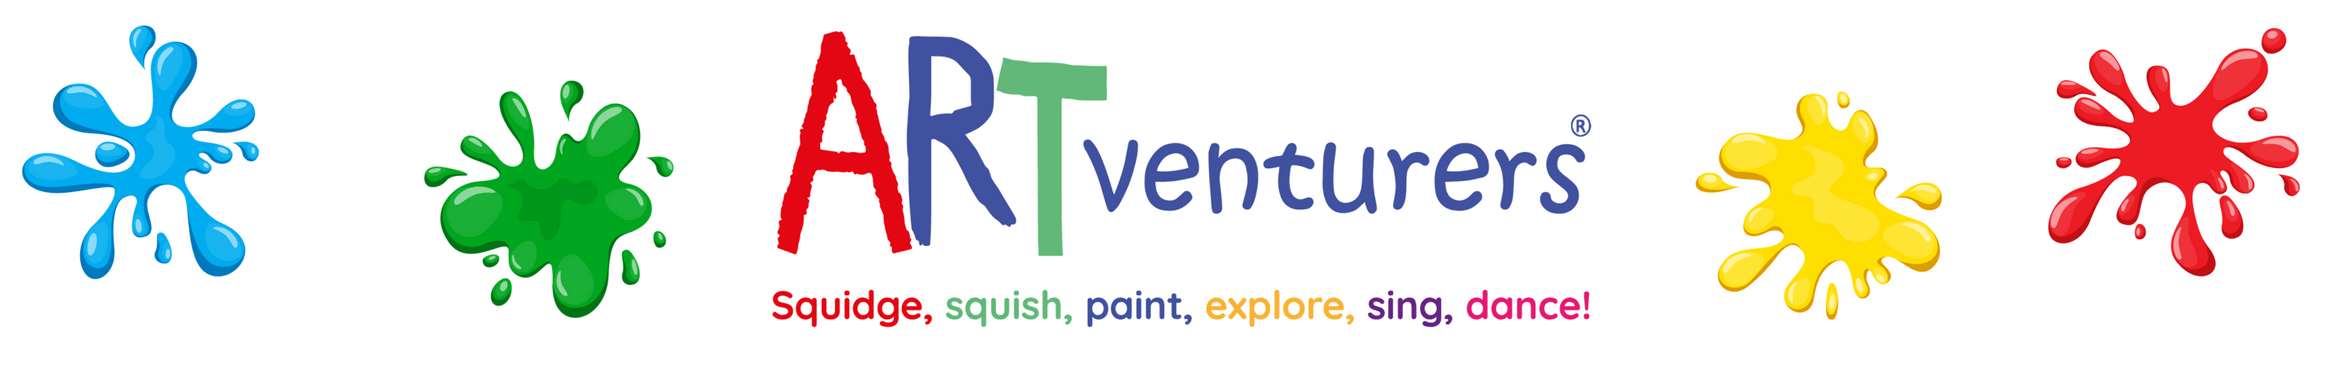 ARTventurers Teddington, Twickenham, Richmond and Hampton